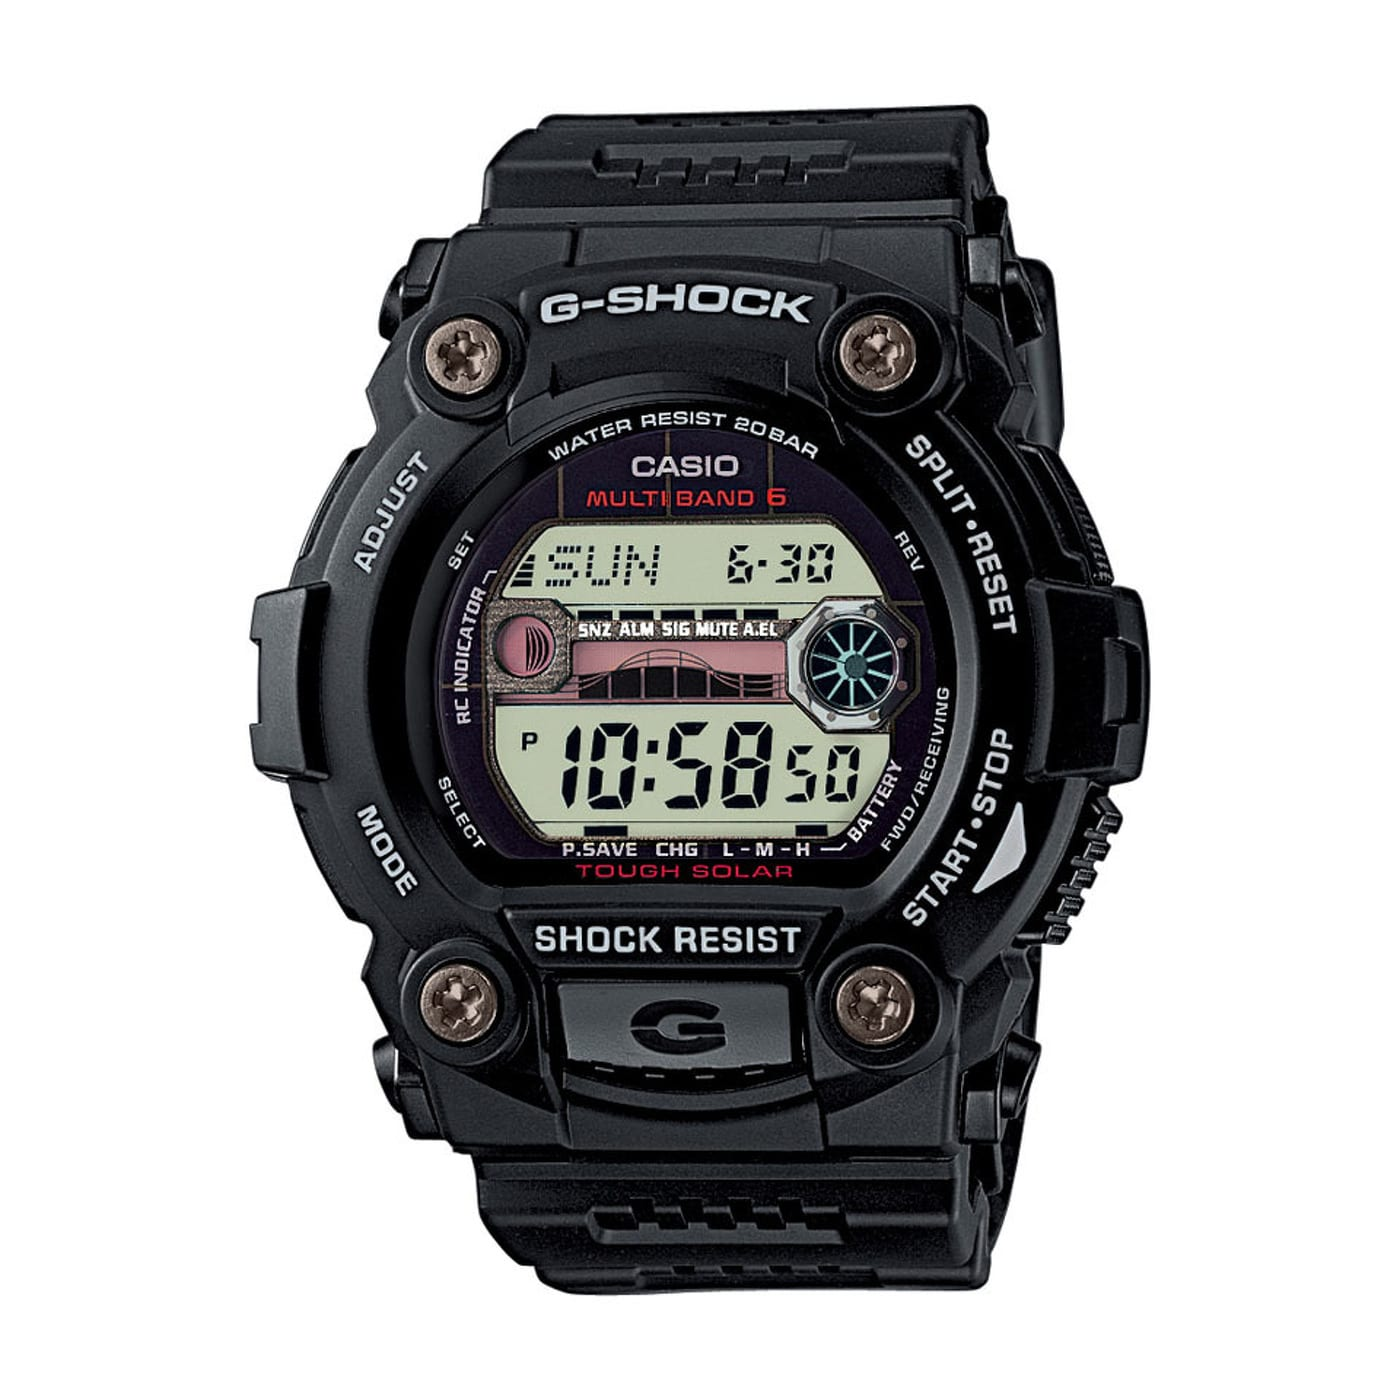 Casio G-Shock GW-7900 1ER čierne